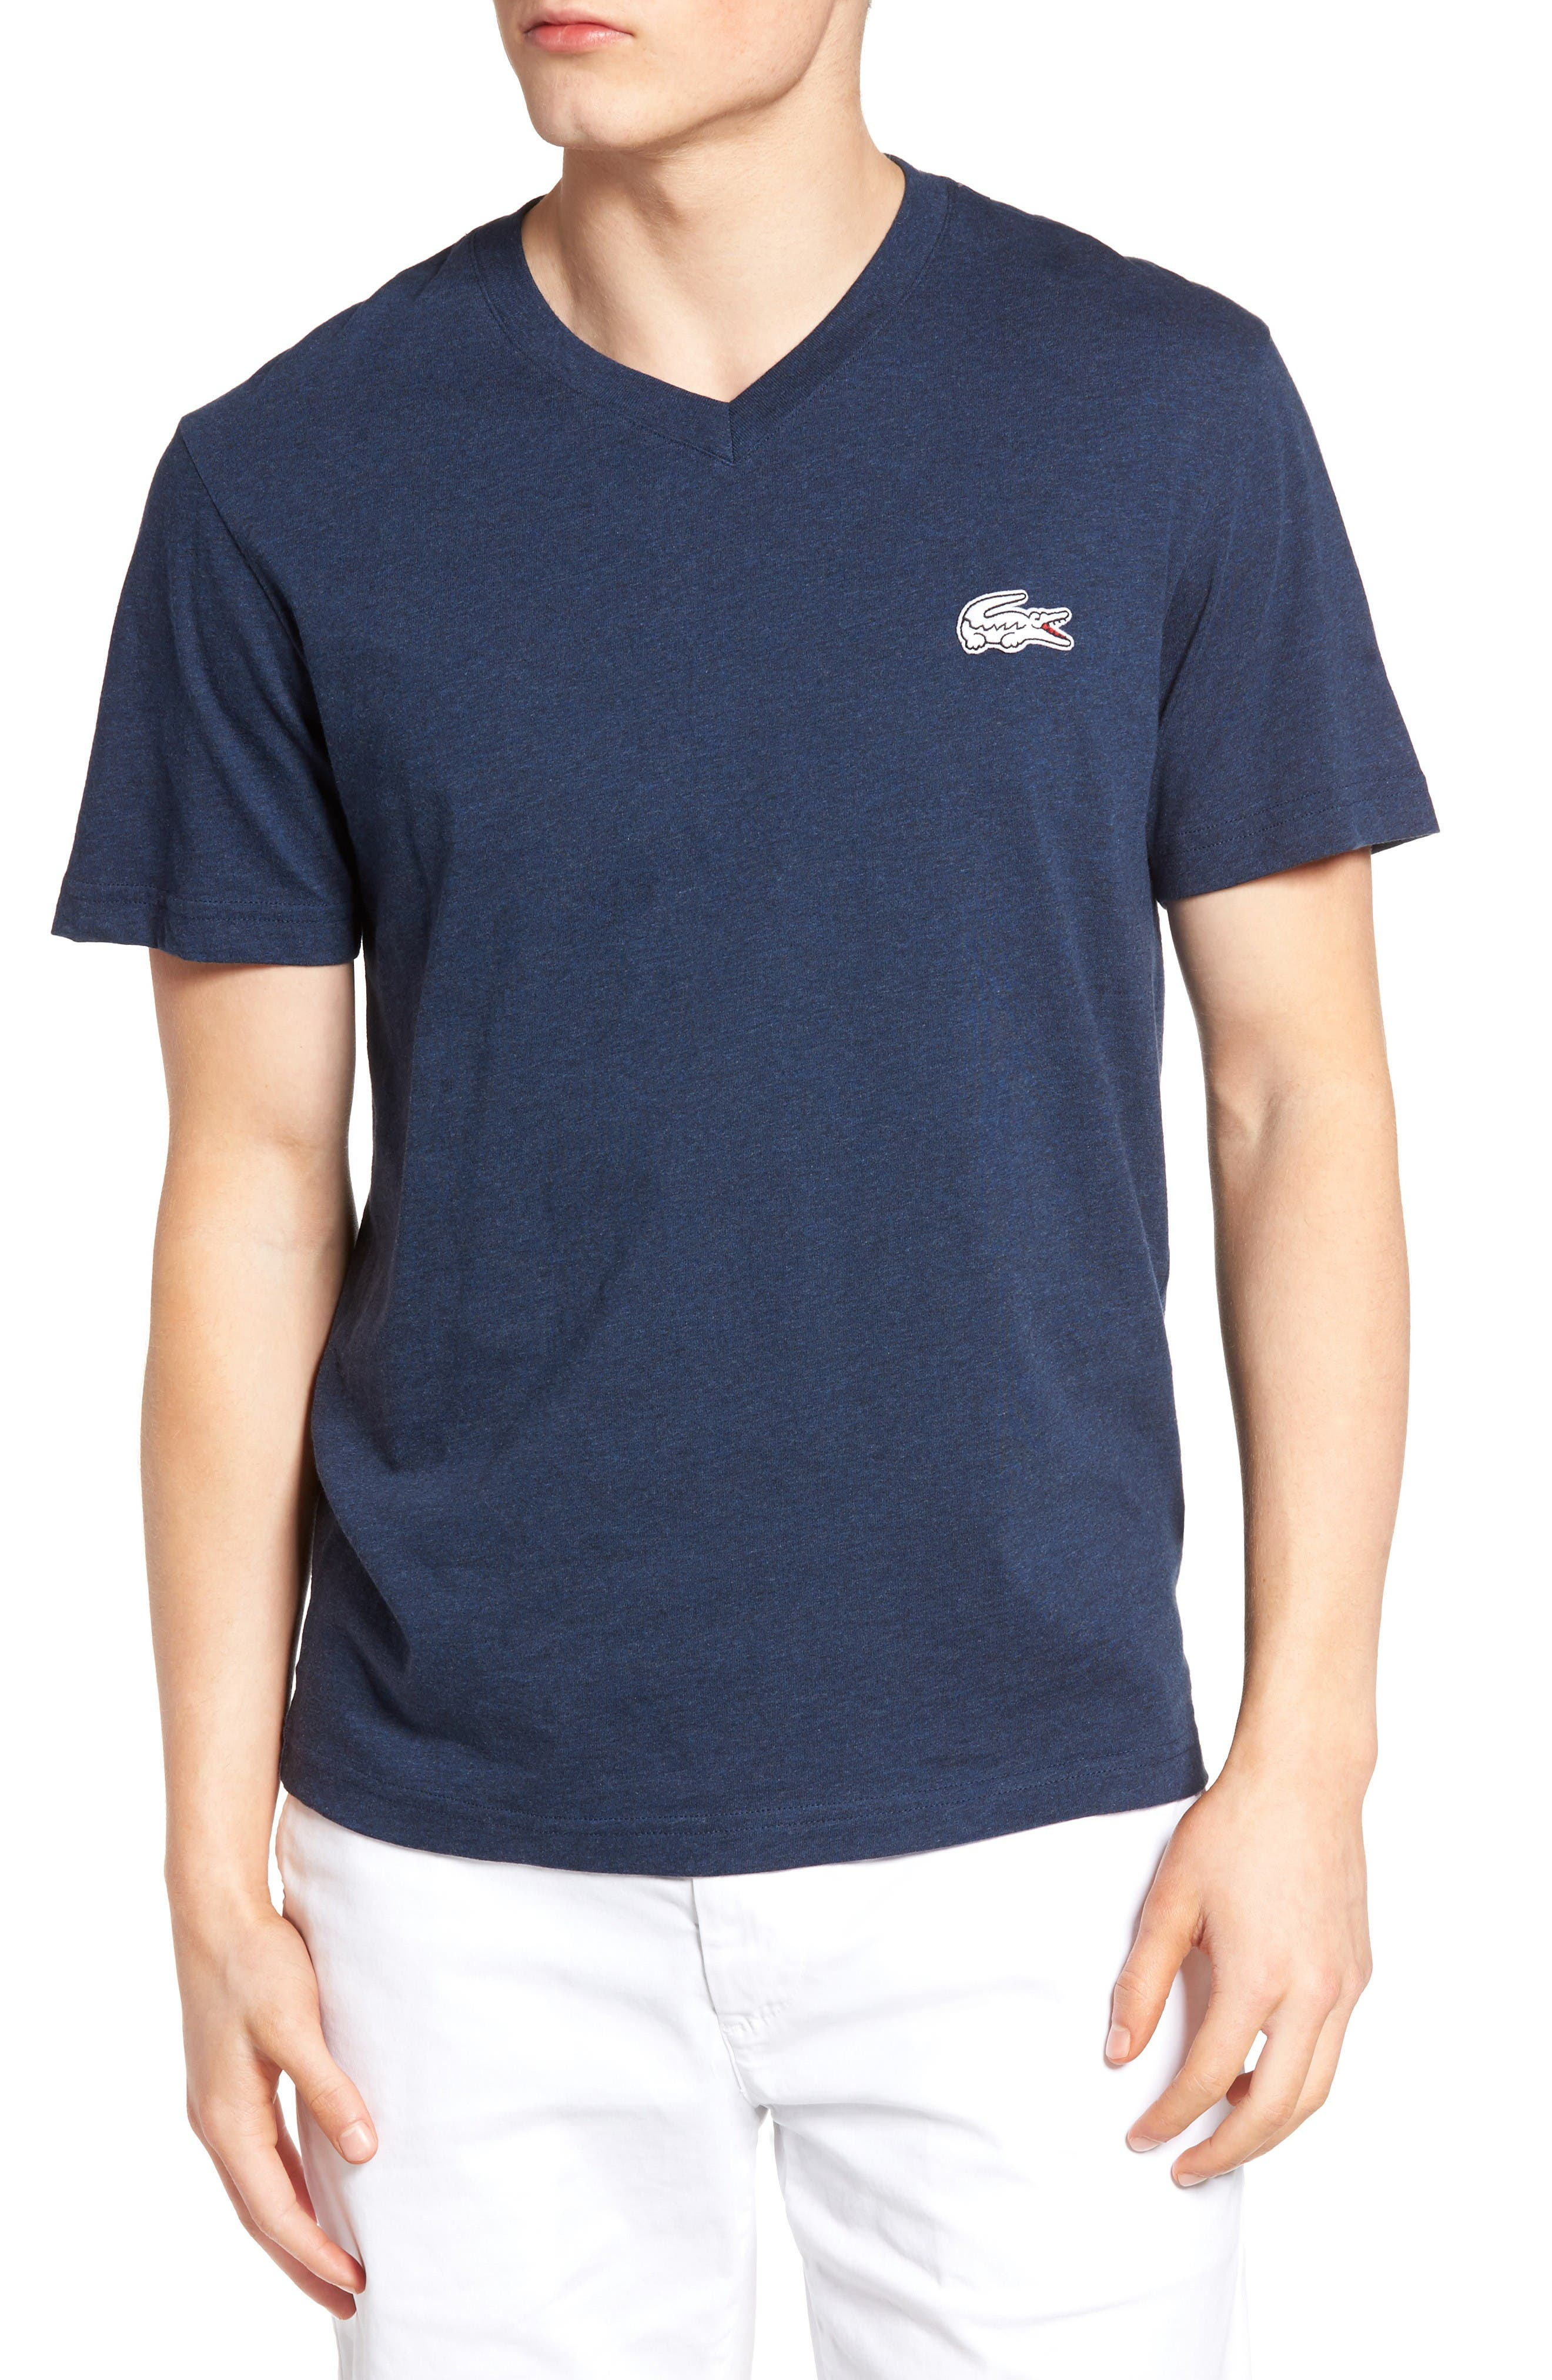 LACOSTE Solid V-Neck T-Shirt